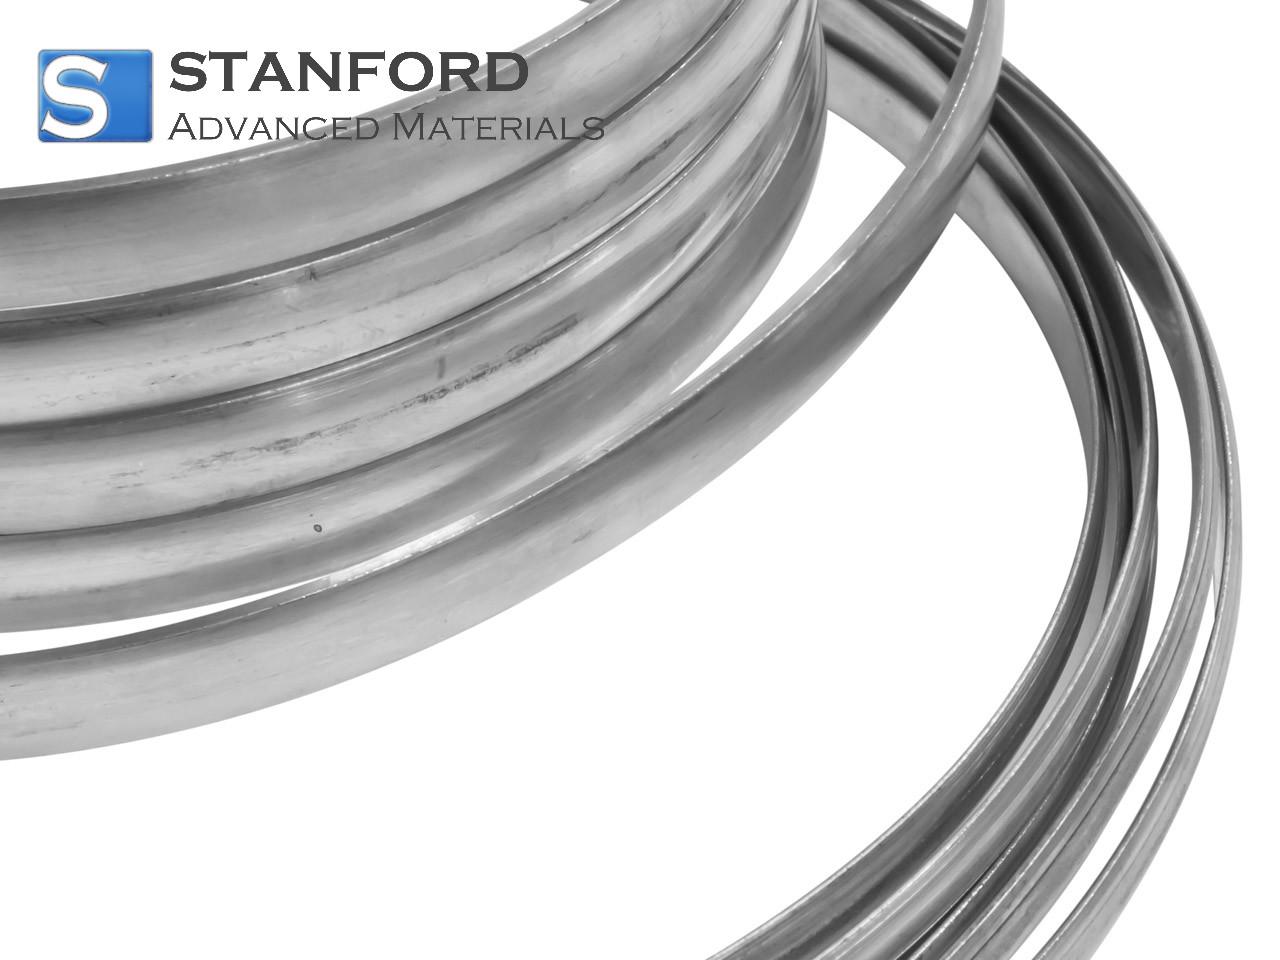 M7 high speed tool steel flat wire